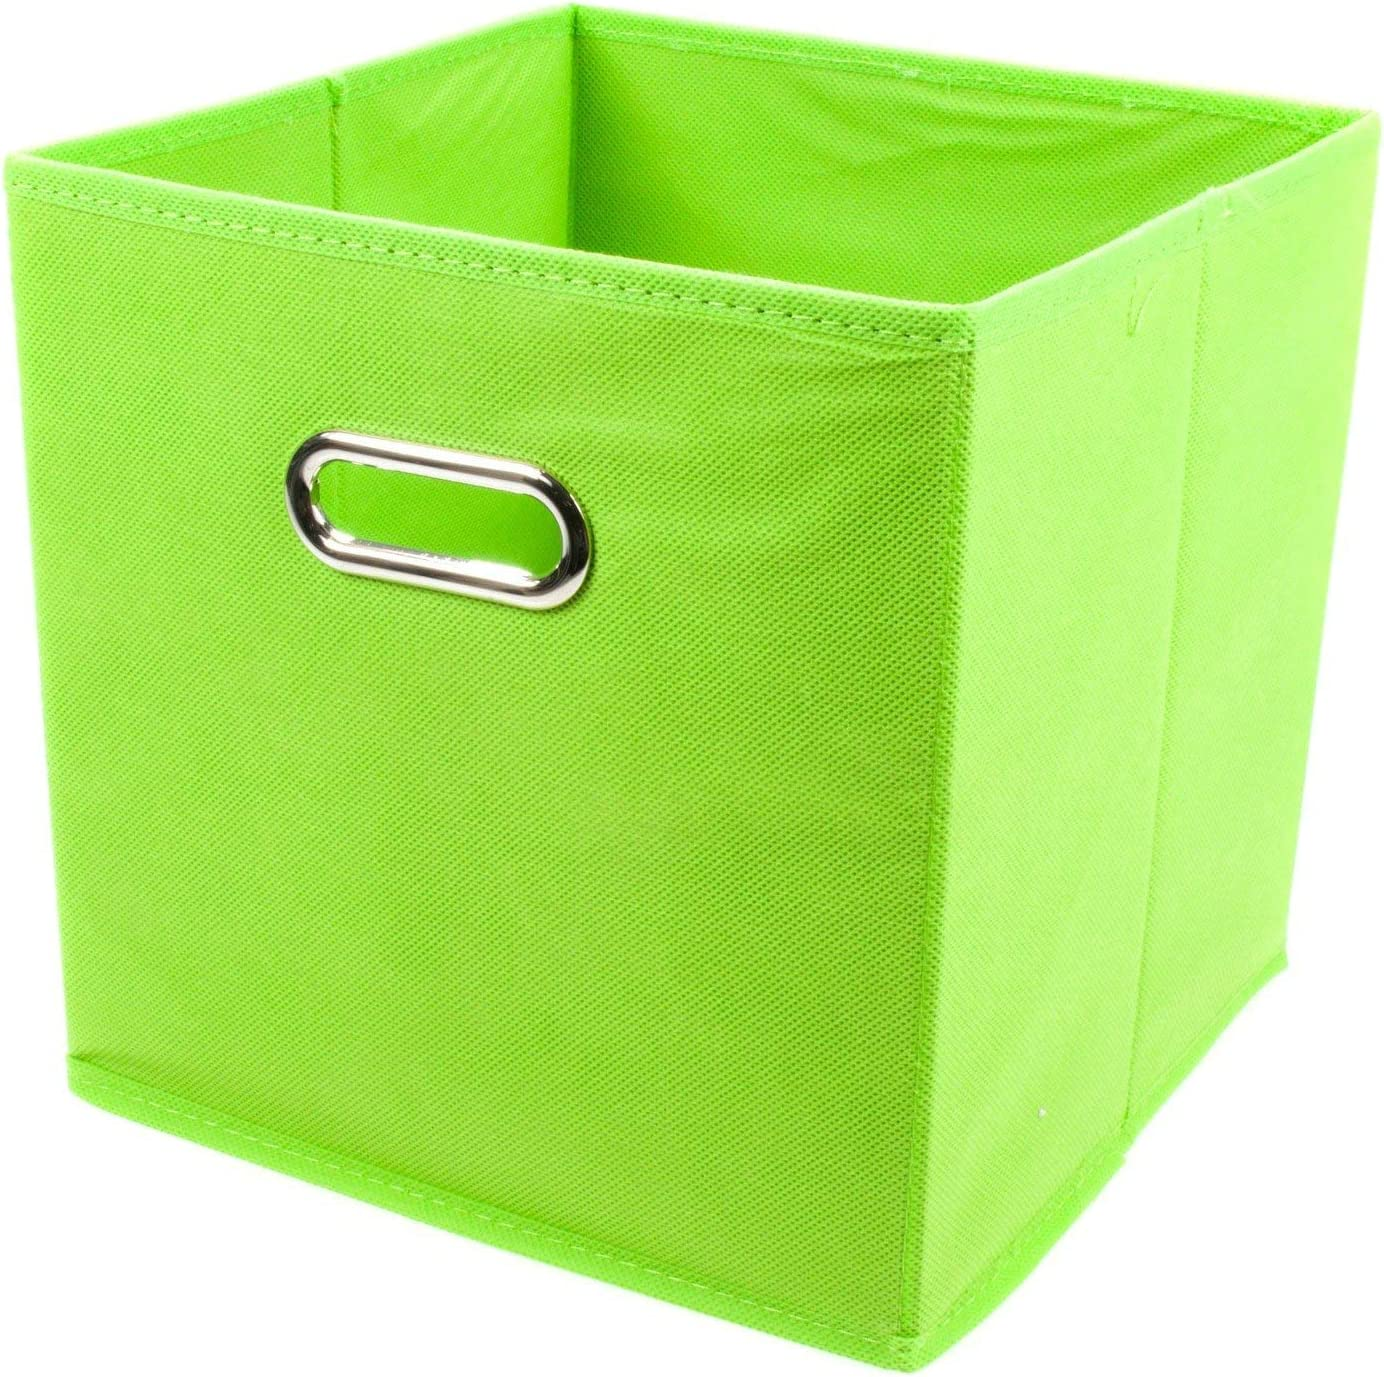 Zeller 14134 - Caja de almacenaje de tela, plegable, 28 x 28 x 28 cm, color verde: Amazon.es: Hogar